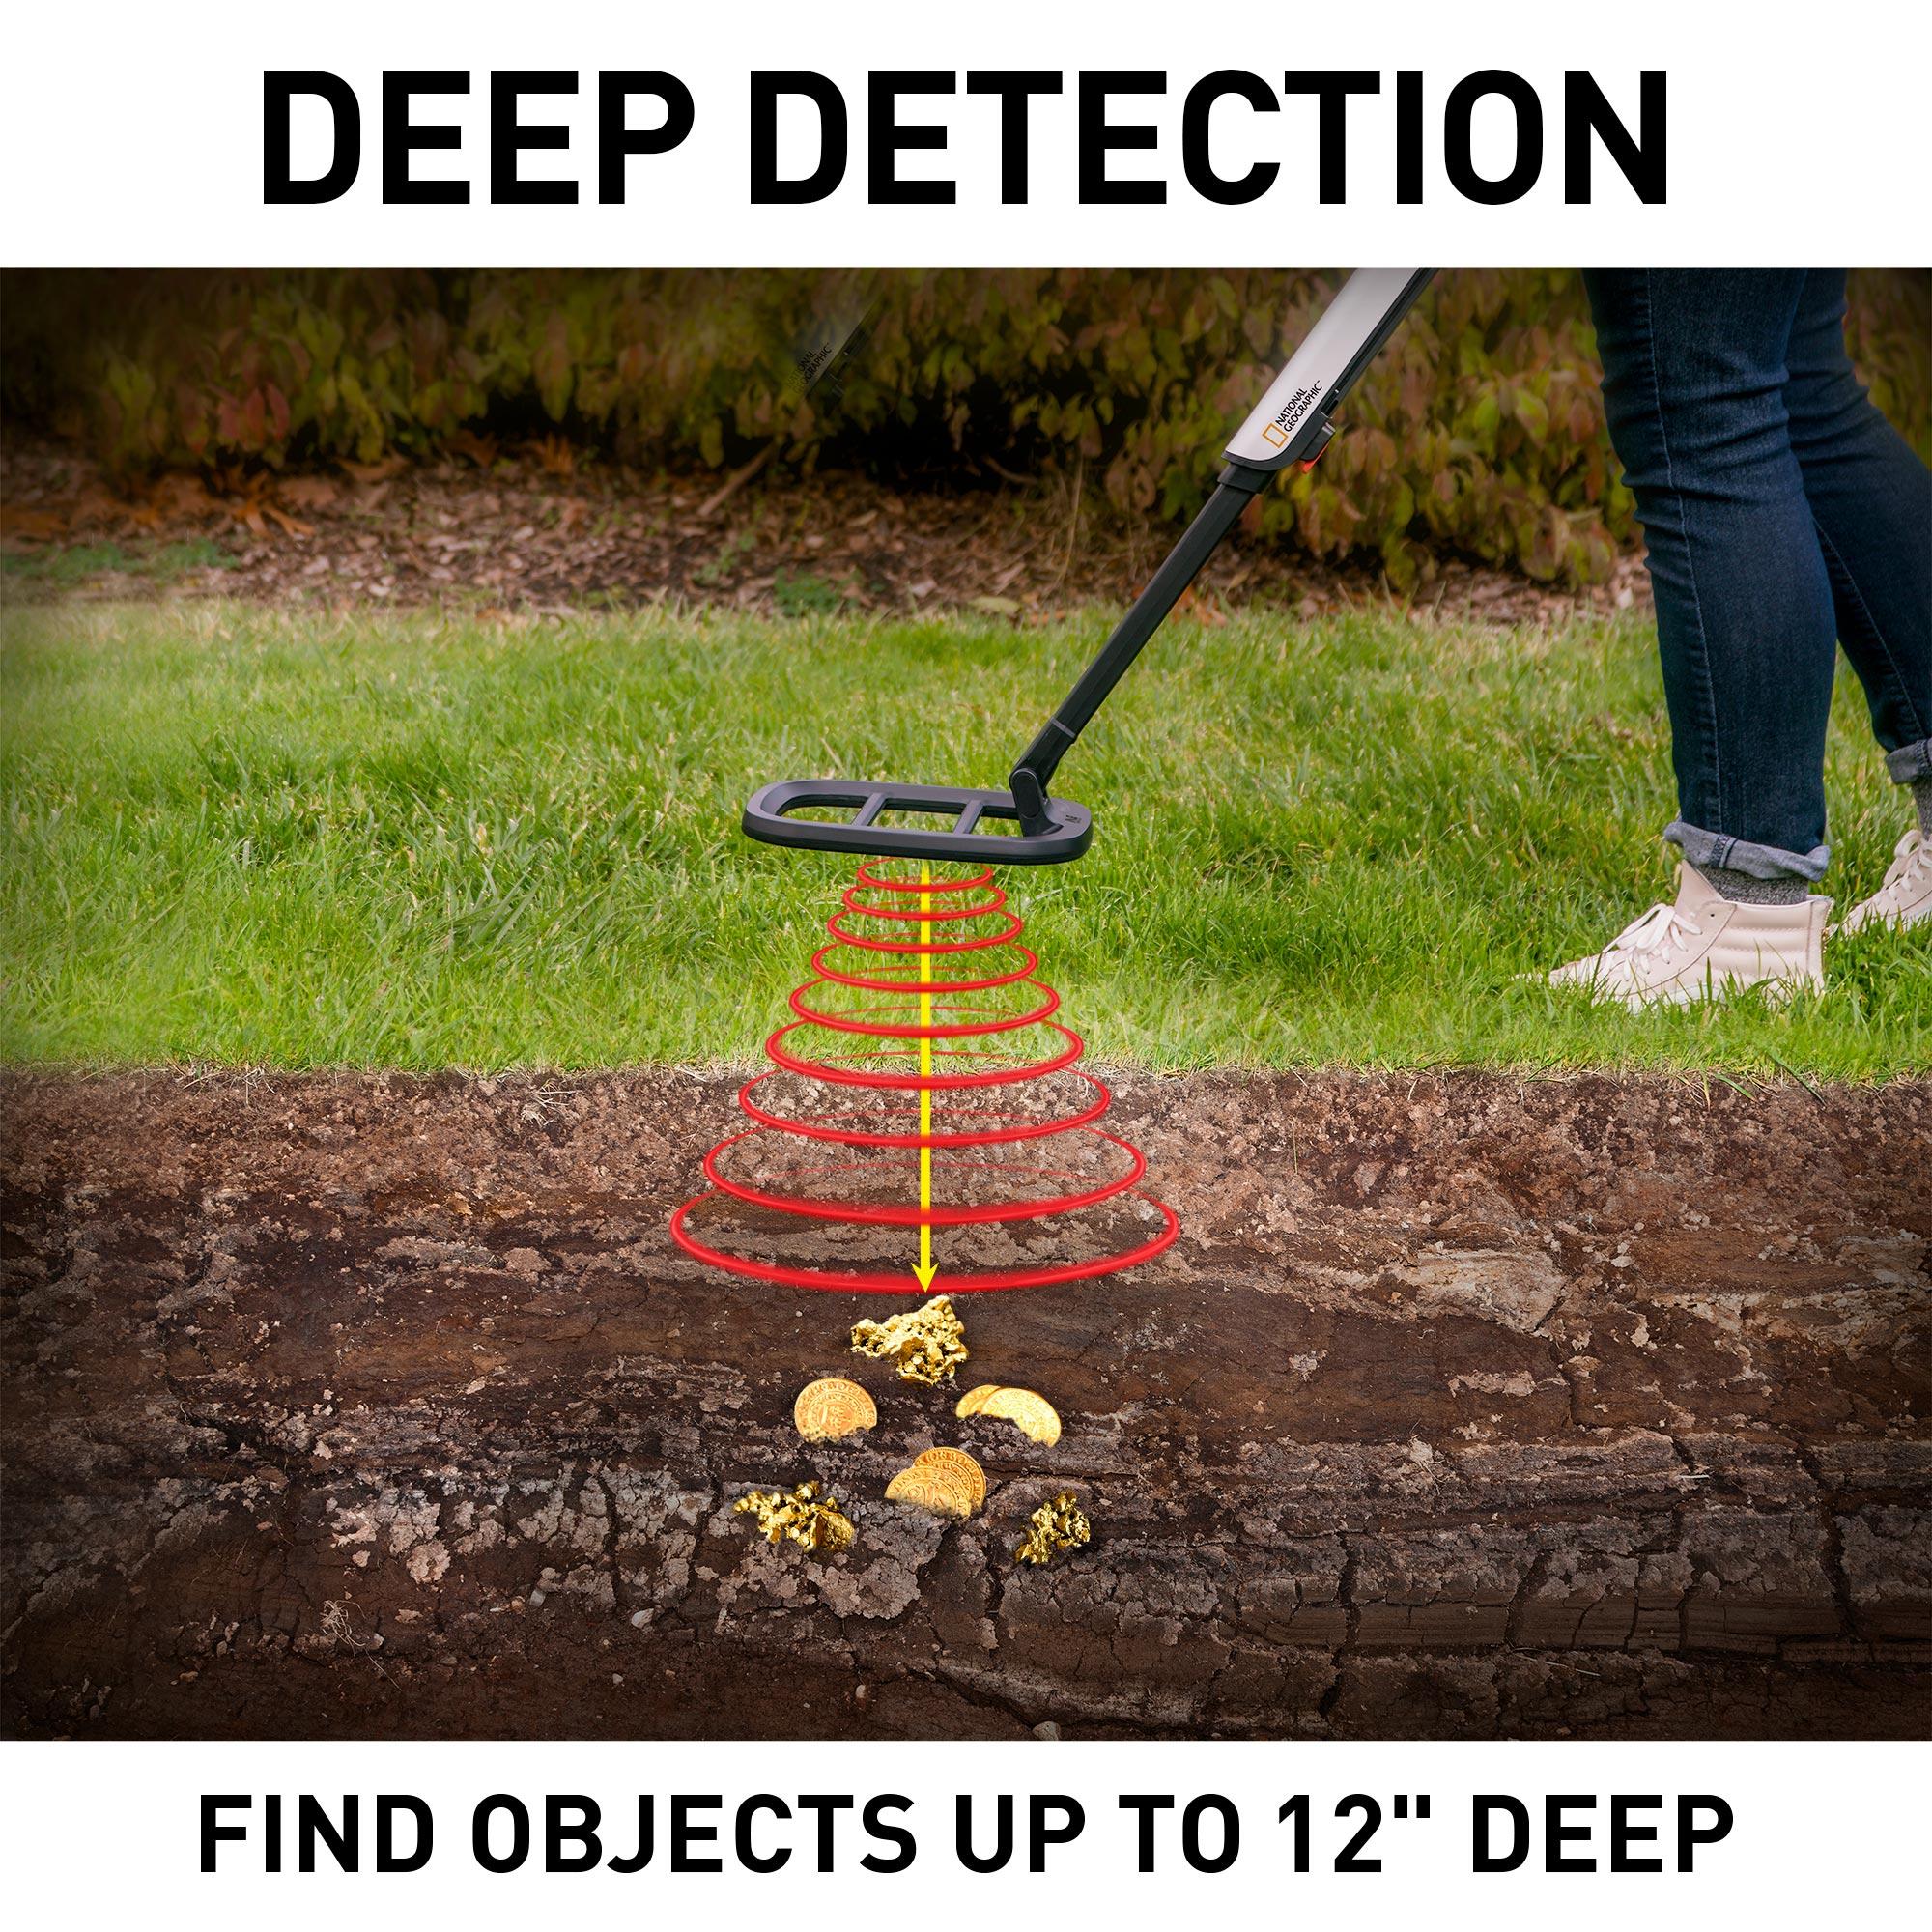 NGProdetector_06_Detection.jpg